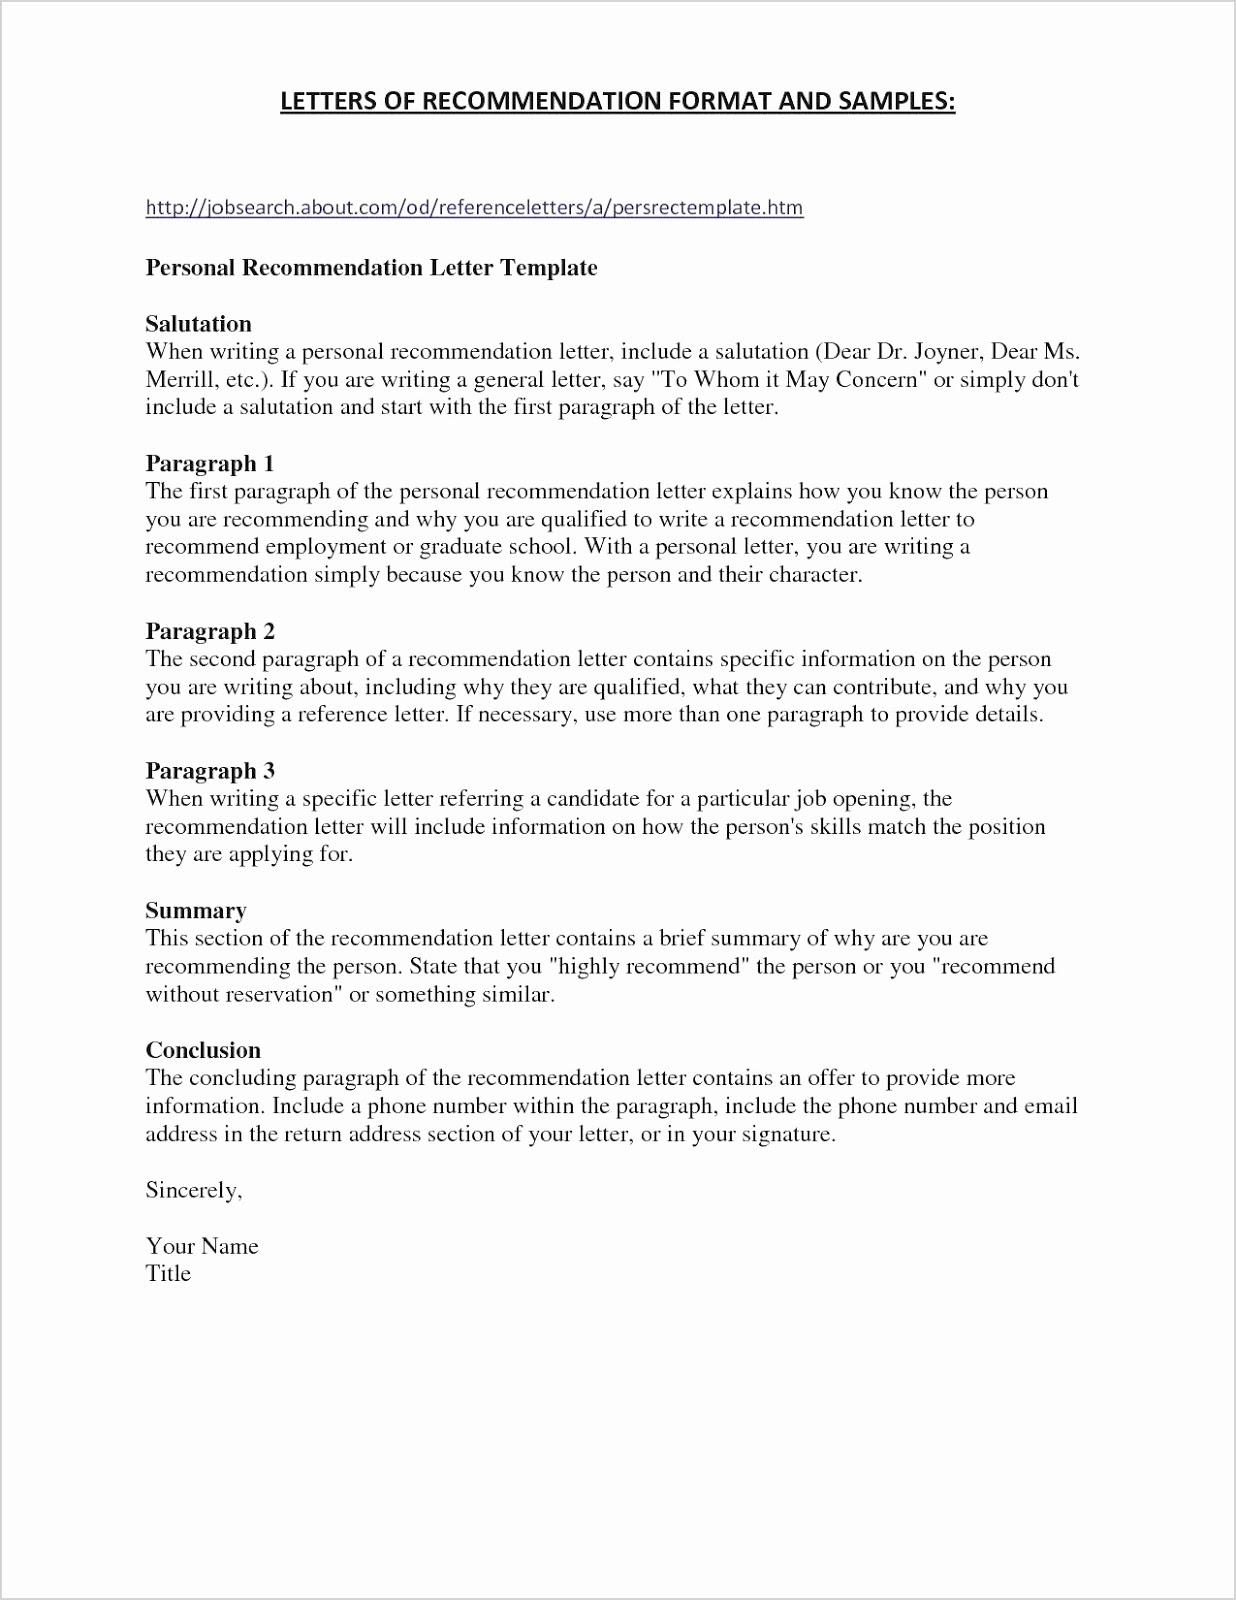 assistant nurse manager resume assistant nurse manager resume objective 2019 assistant nurse manager resume examples assistant nurse manager resume sample assistant nurse manager resume cover letter 2020 objective for assistant nurse manager resume resume for assistant nurse manager position sample resume for assistant nurse manager position